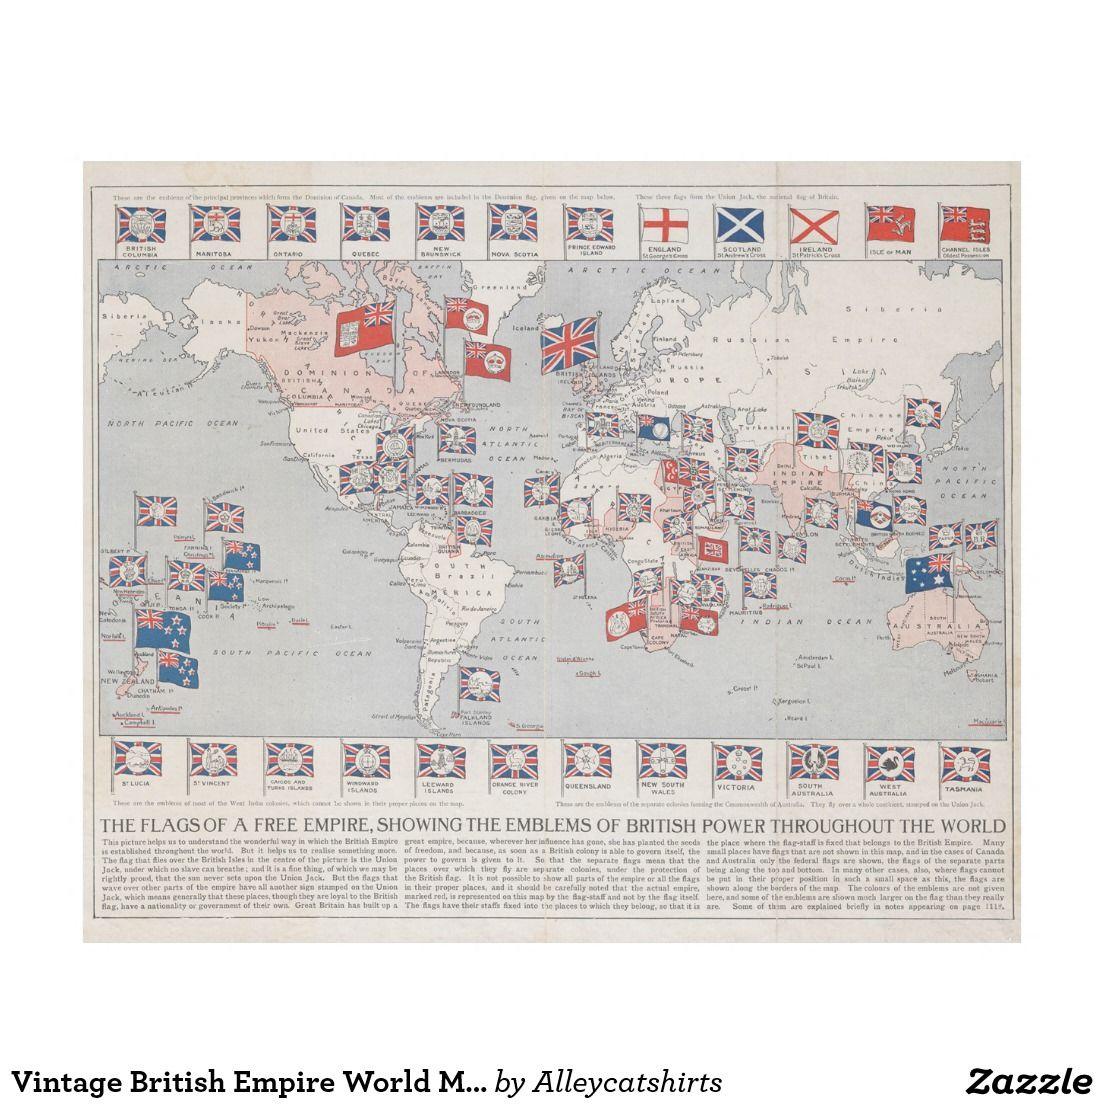 Vintage british empire world map 1910 fleece blanket empire and shop vintage british empire world map fleece blanket created by alleycatshirts gumiabroncs Images